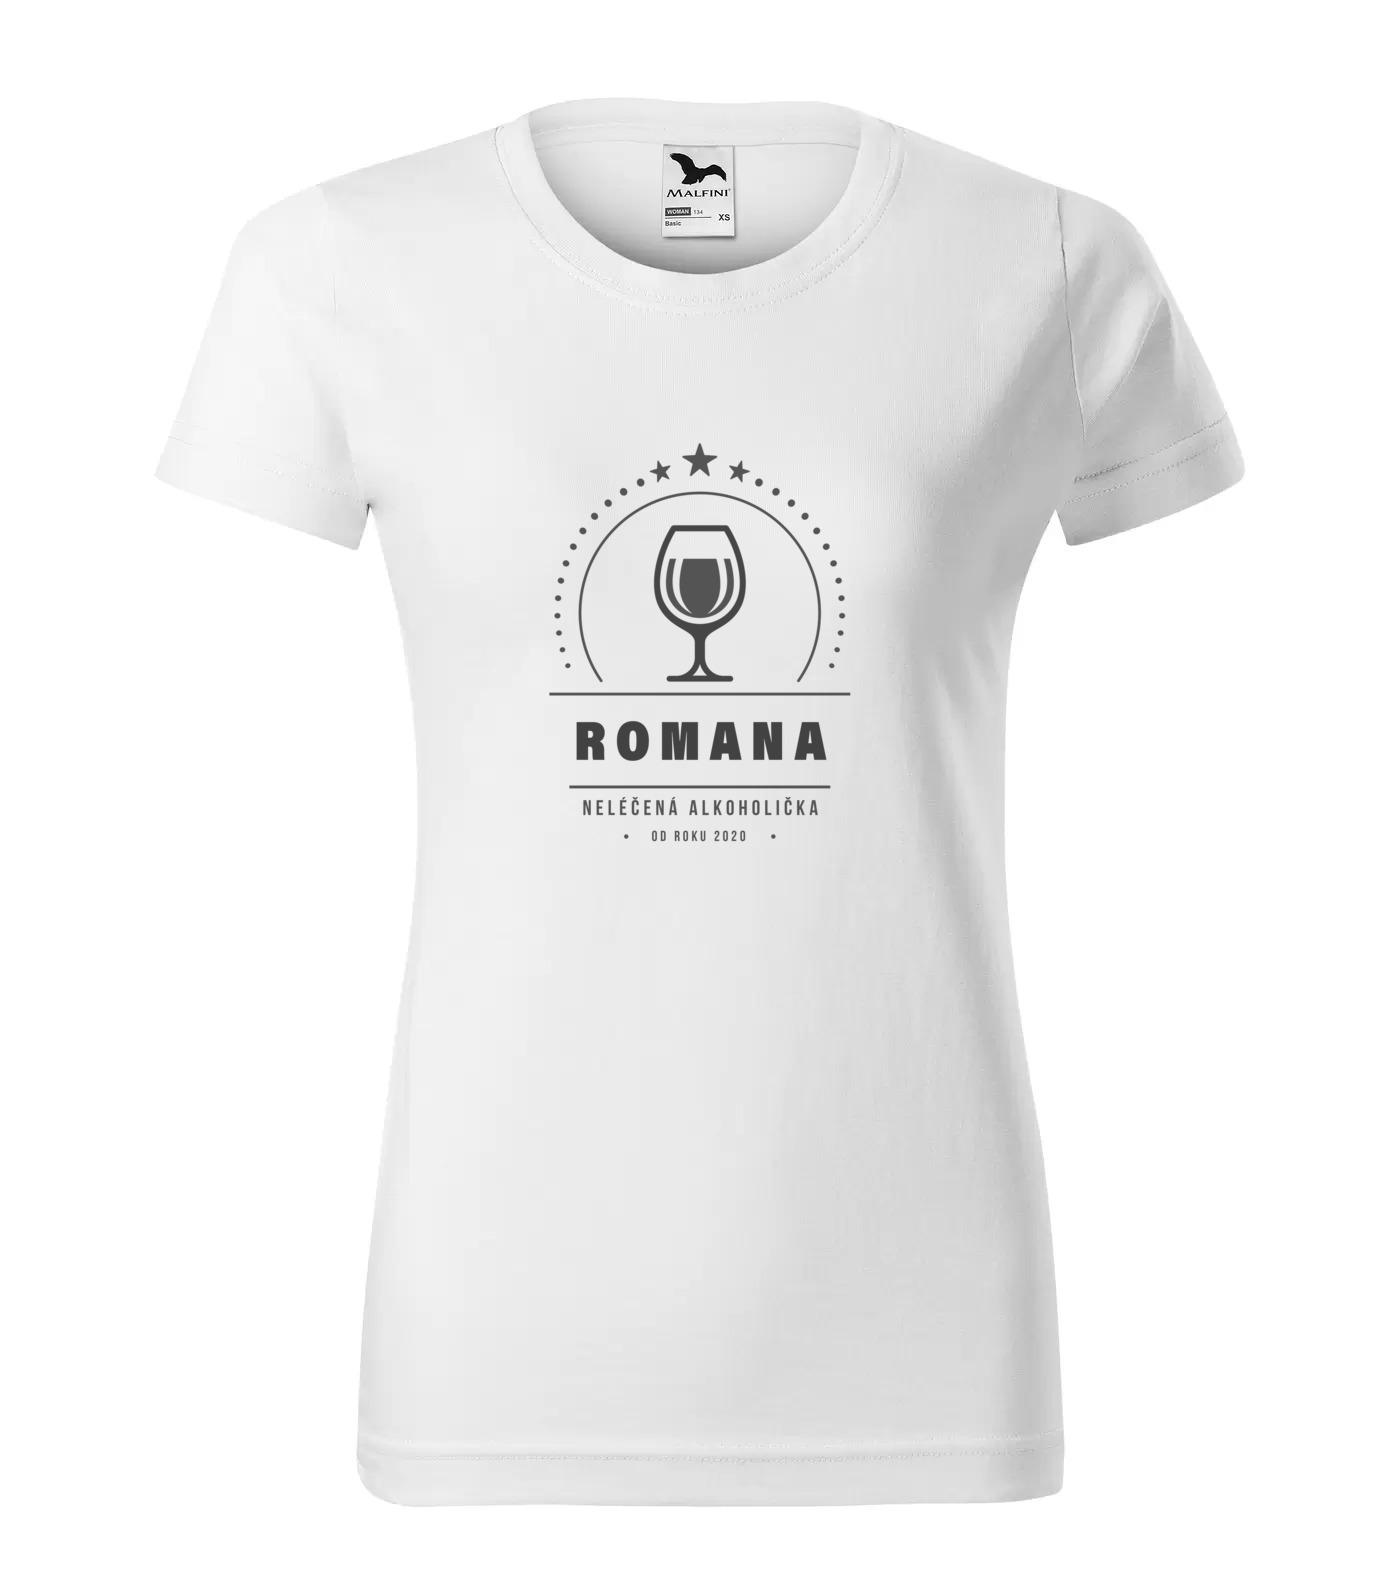 Tričko Alkoholička Romana